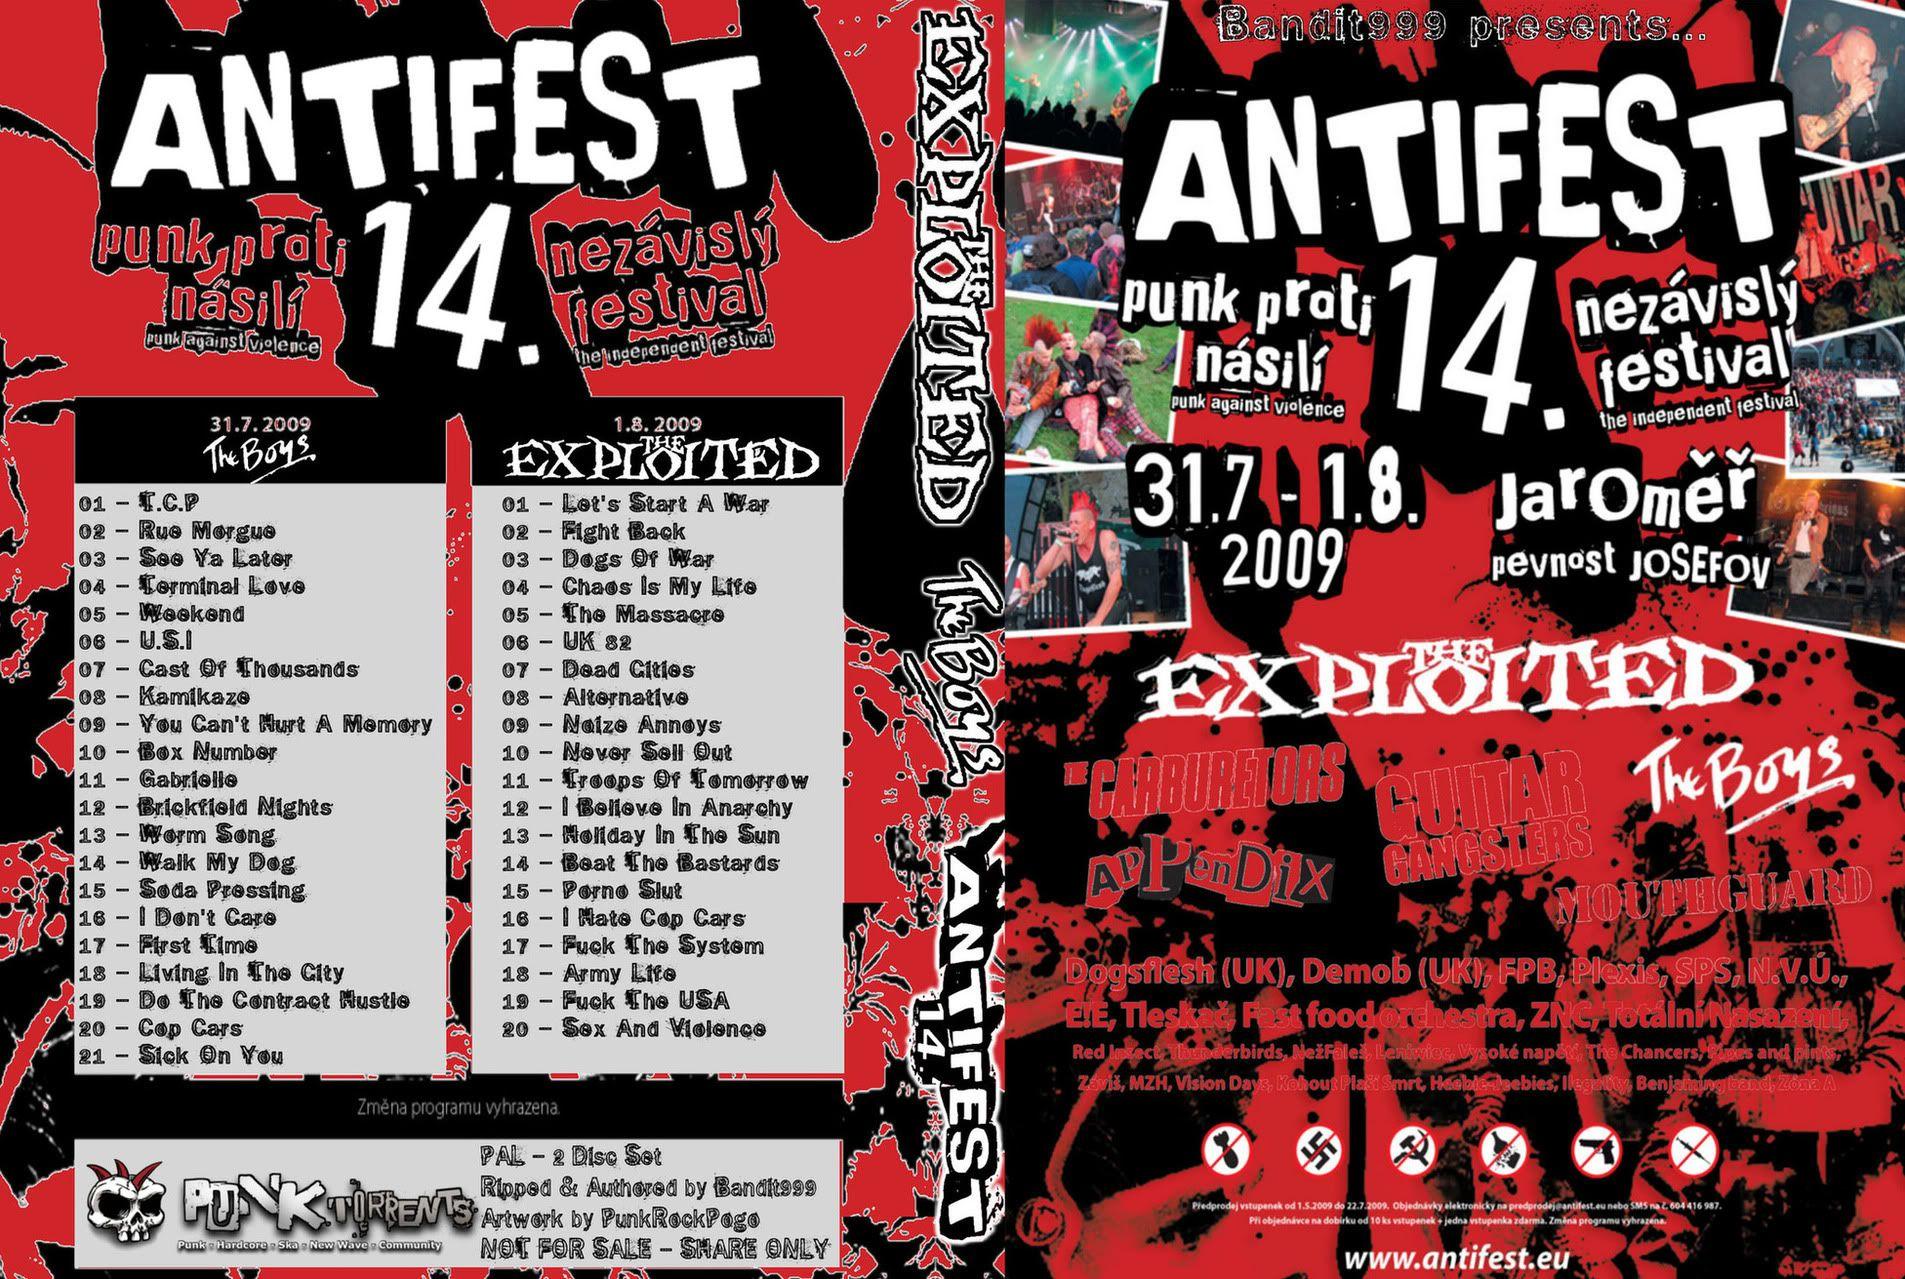 exploitedboys-antifest.jpg (1905×1279)